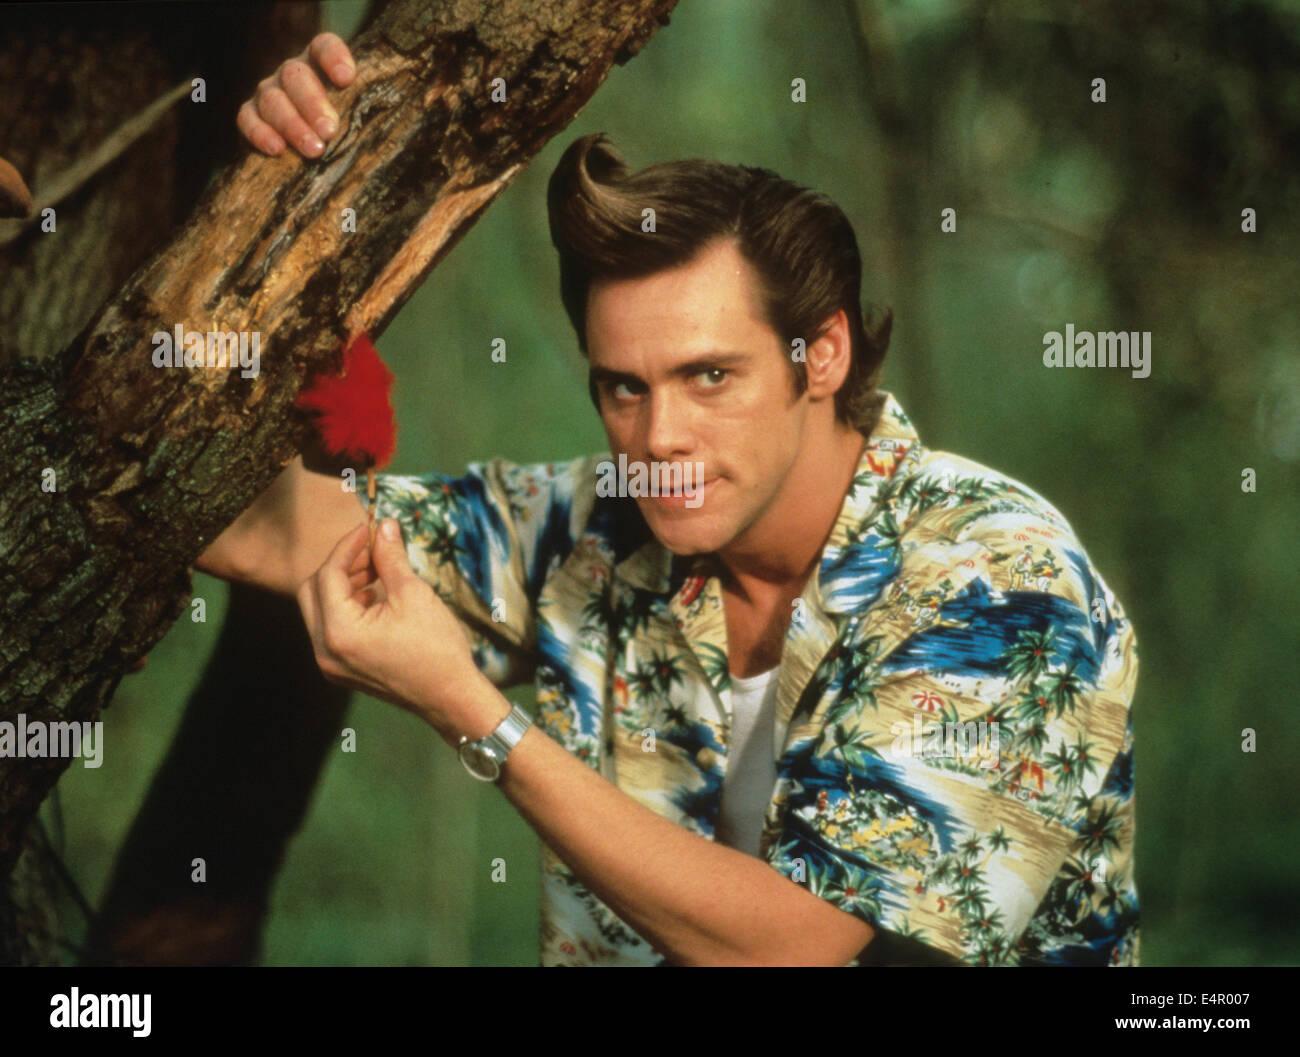 ACE VENTURA: WHEN NATURE CALLS  1995 Warner Bros film with Jim Carrey - Stock Image